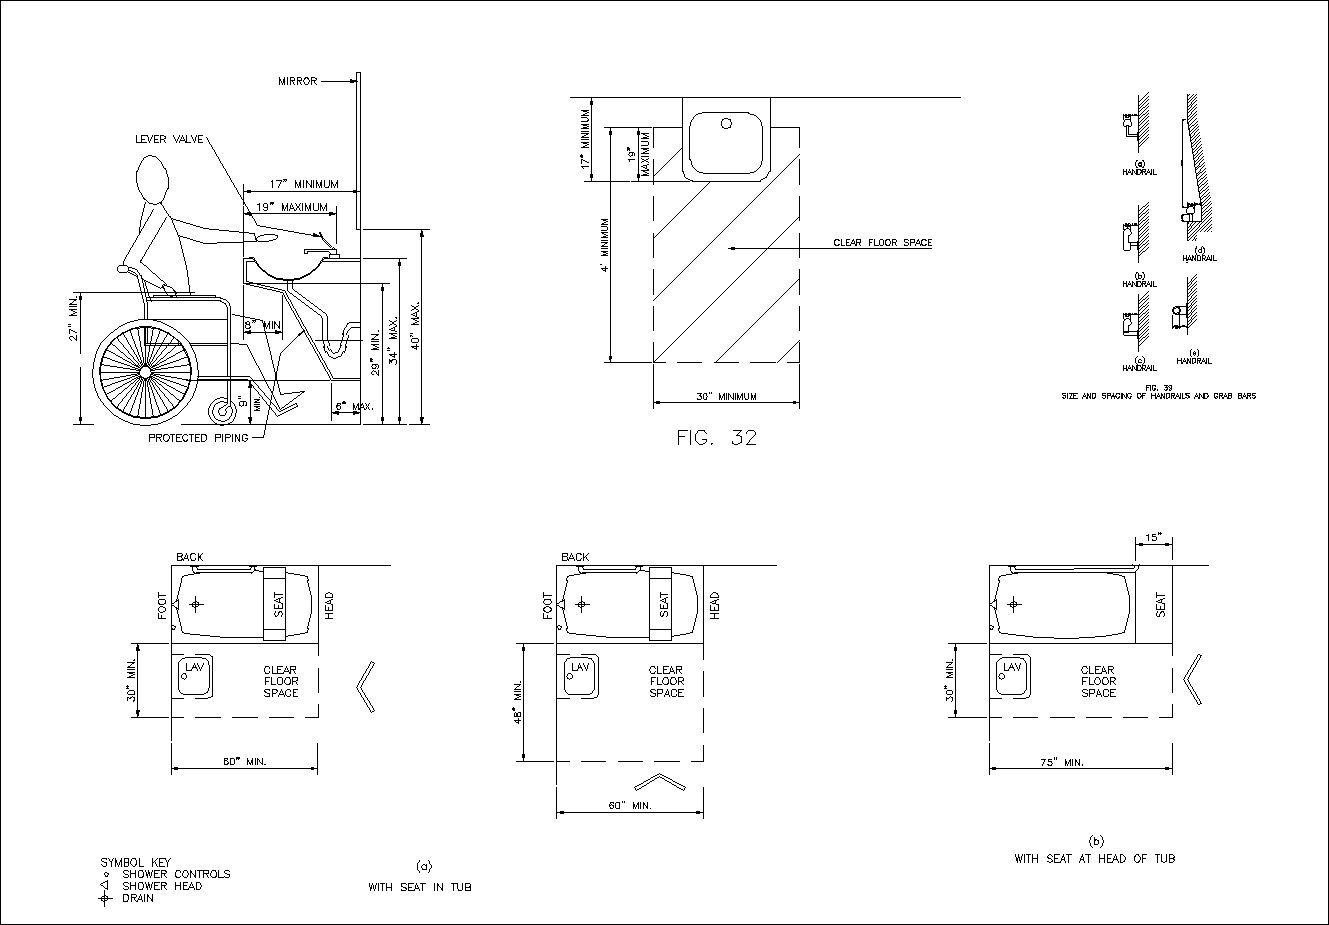 Accessibility Facilities Drawings V2 Handicap Block Diagram Drawing Images Free Download Cad Design Blocksdrawings Details